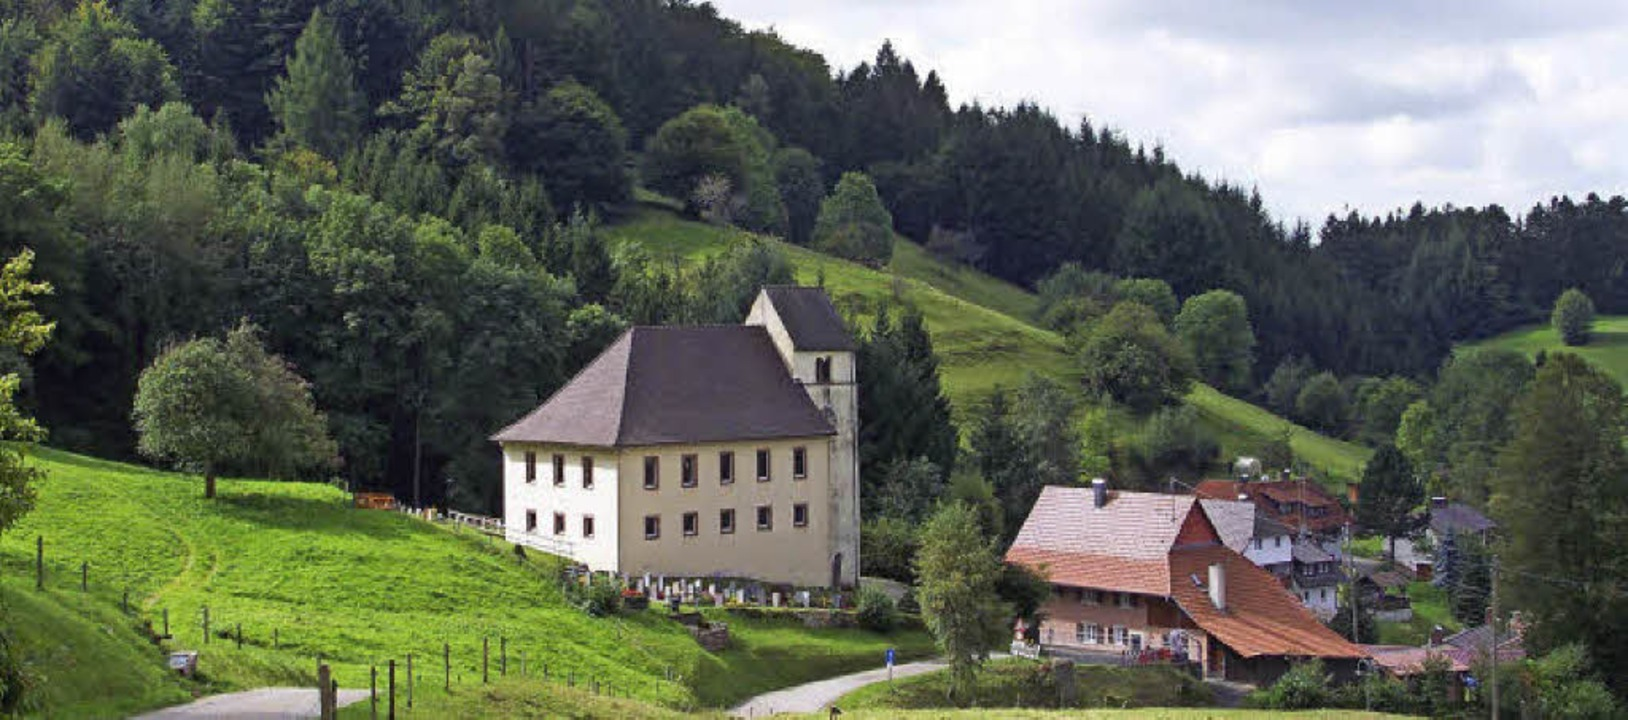 Die Michaelskirche Kaltenbach ist Ausgangspunkt des Geschichtsweges    Foto: Rolf-Dieter Kanmacher